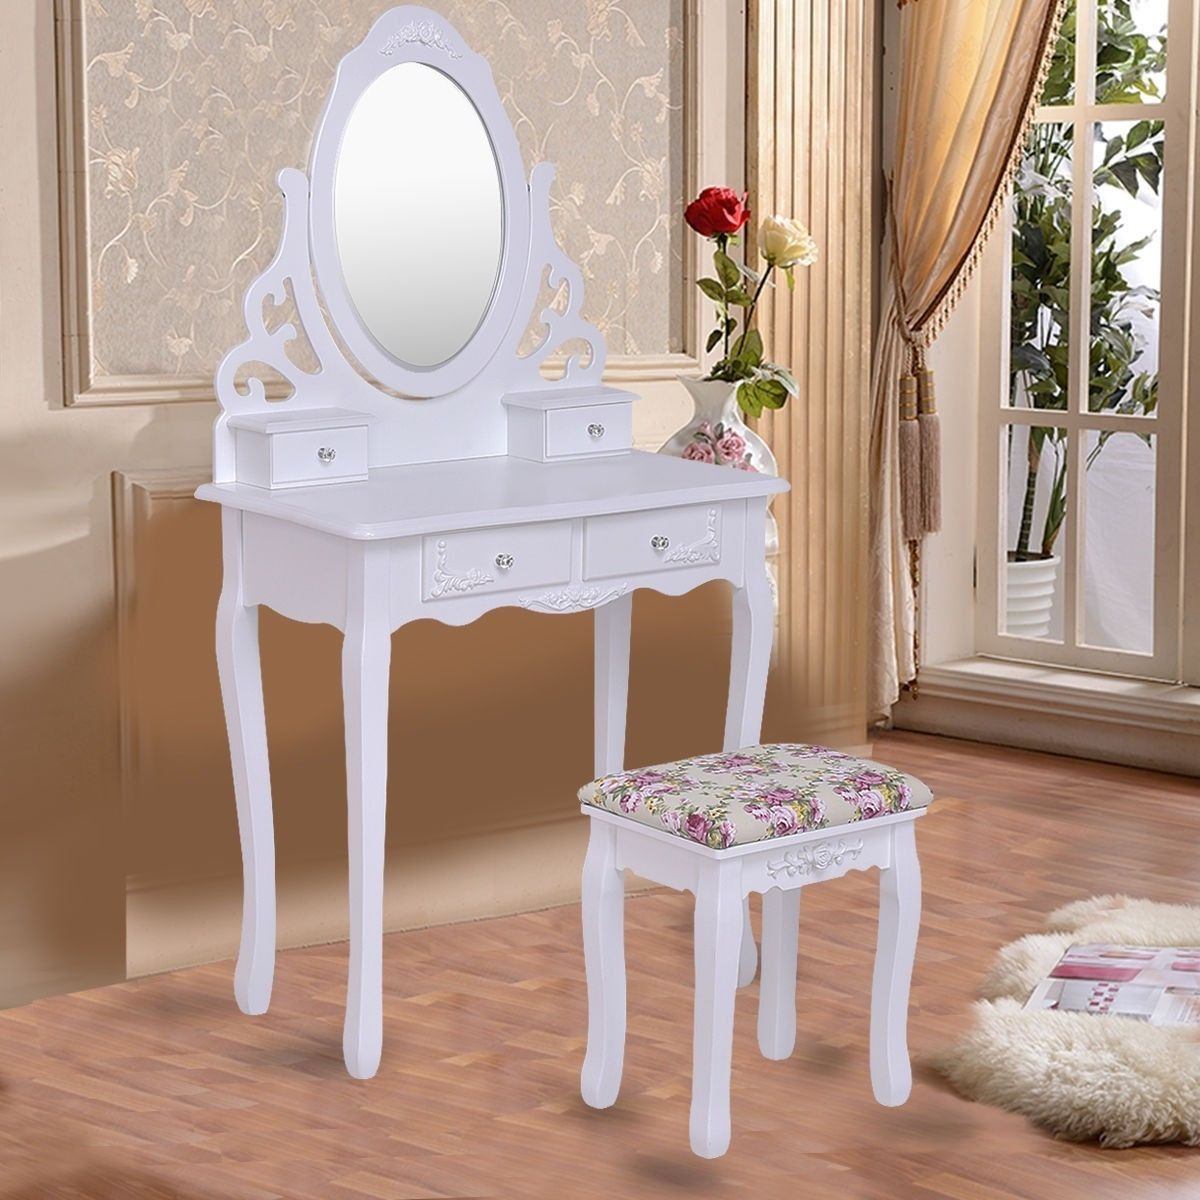 Image of Vanity Makeup Dressing Table Stool Set